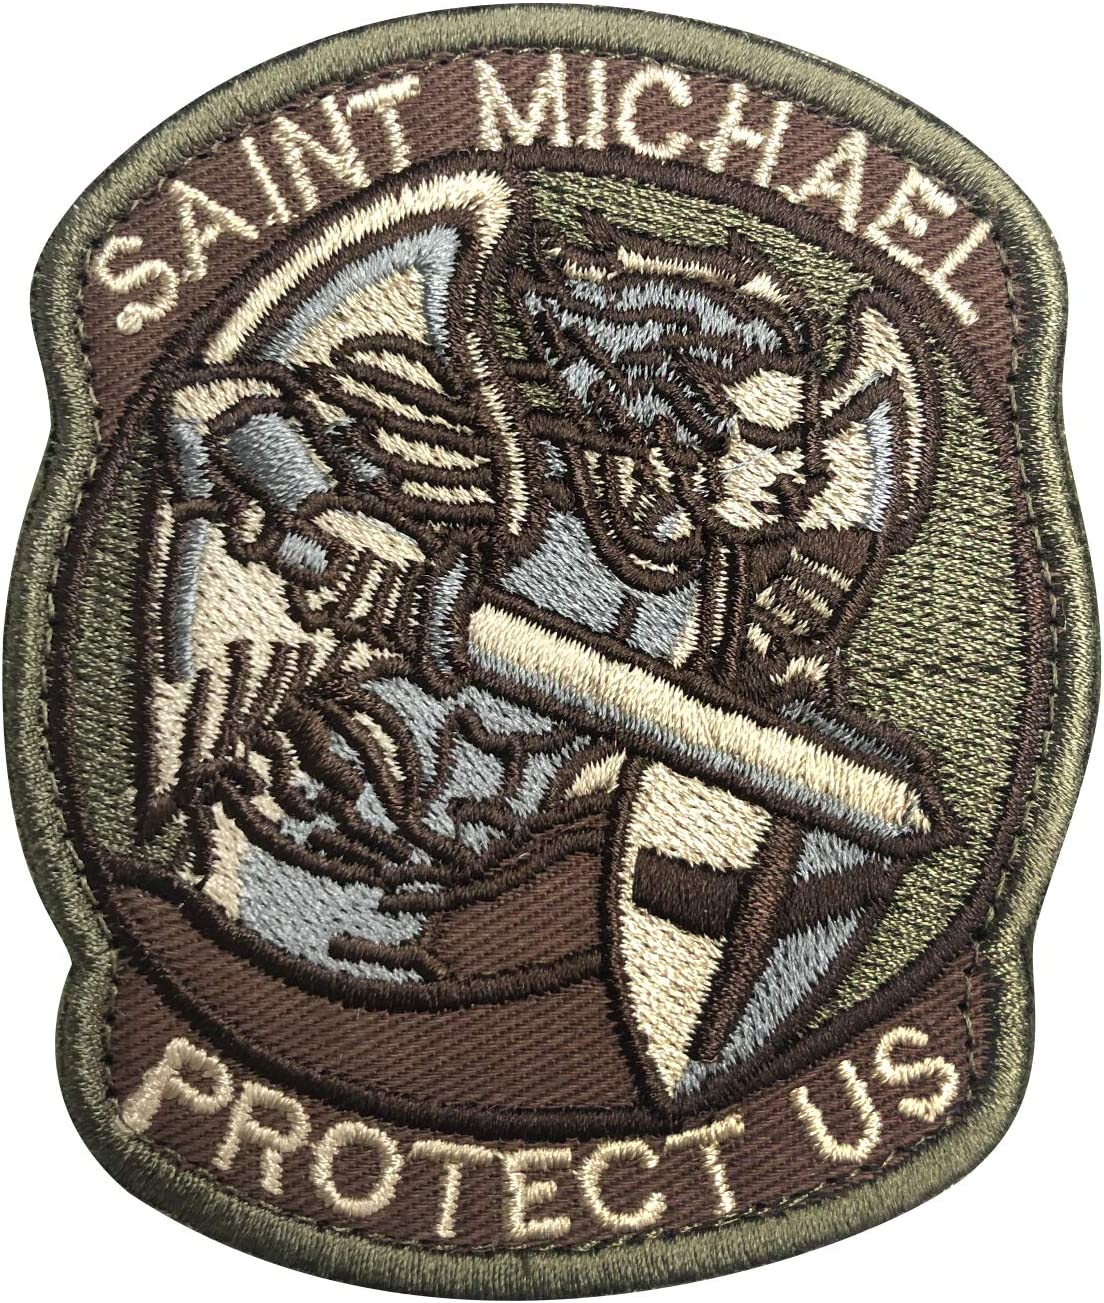 Mil-Spec Monkey Embroidered Saint Michael Modern Hook Fastener Morale Patch ACU